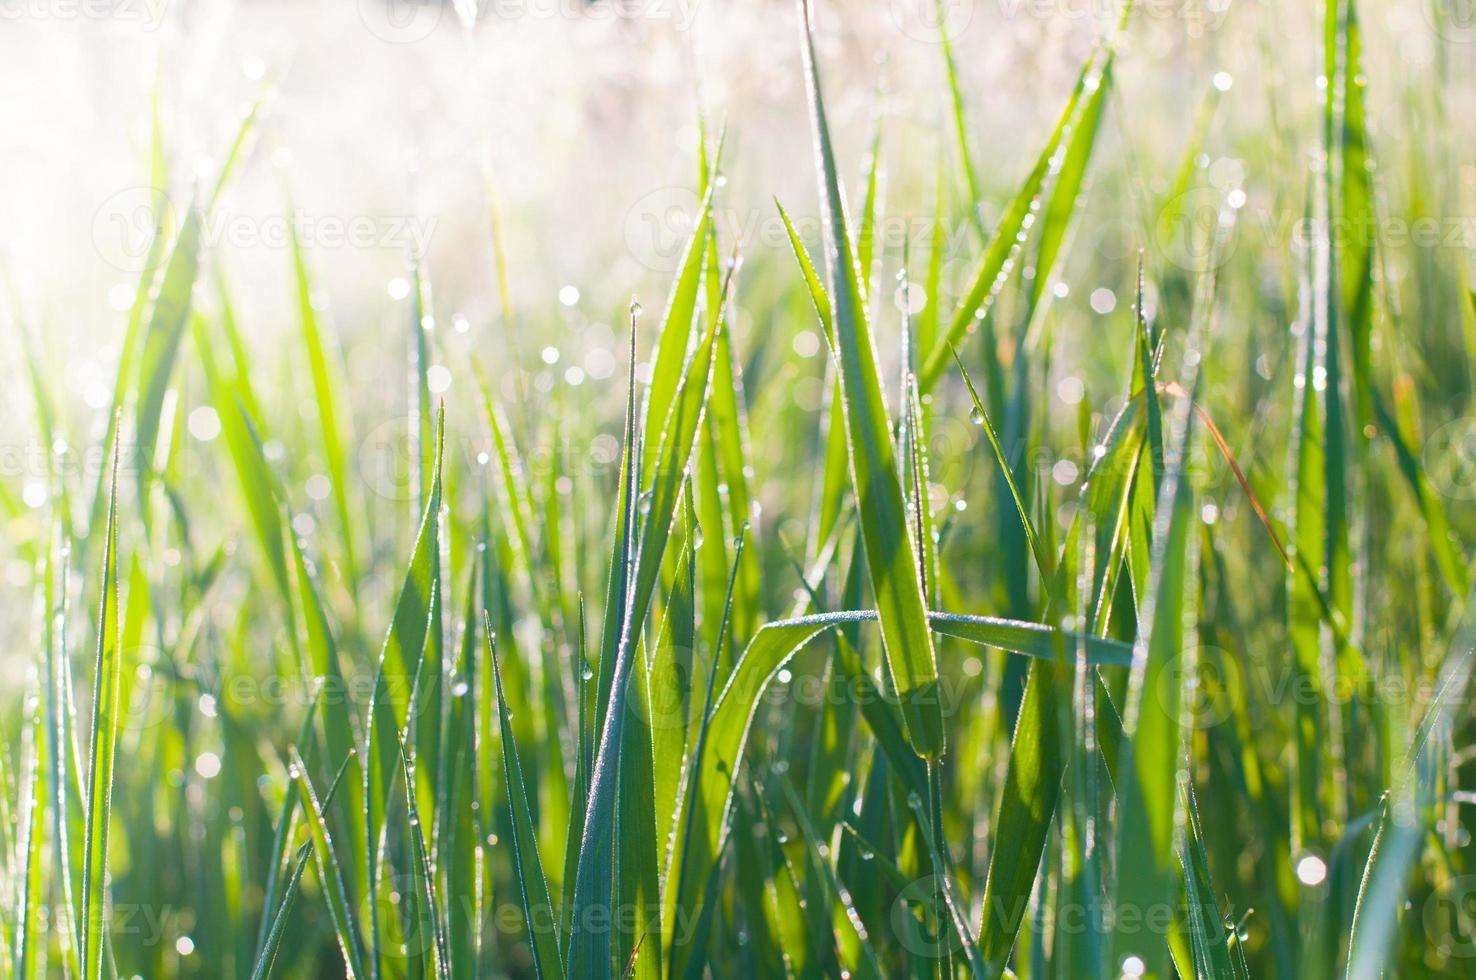 Tau auf Gras foto